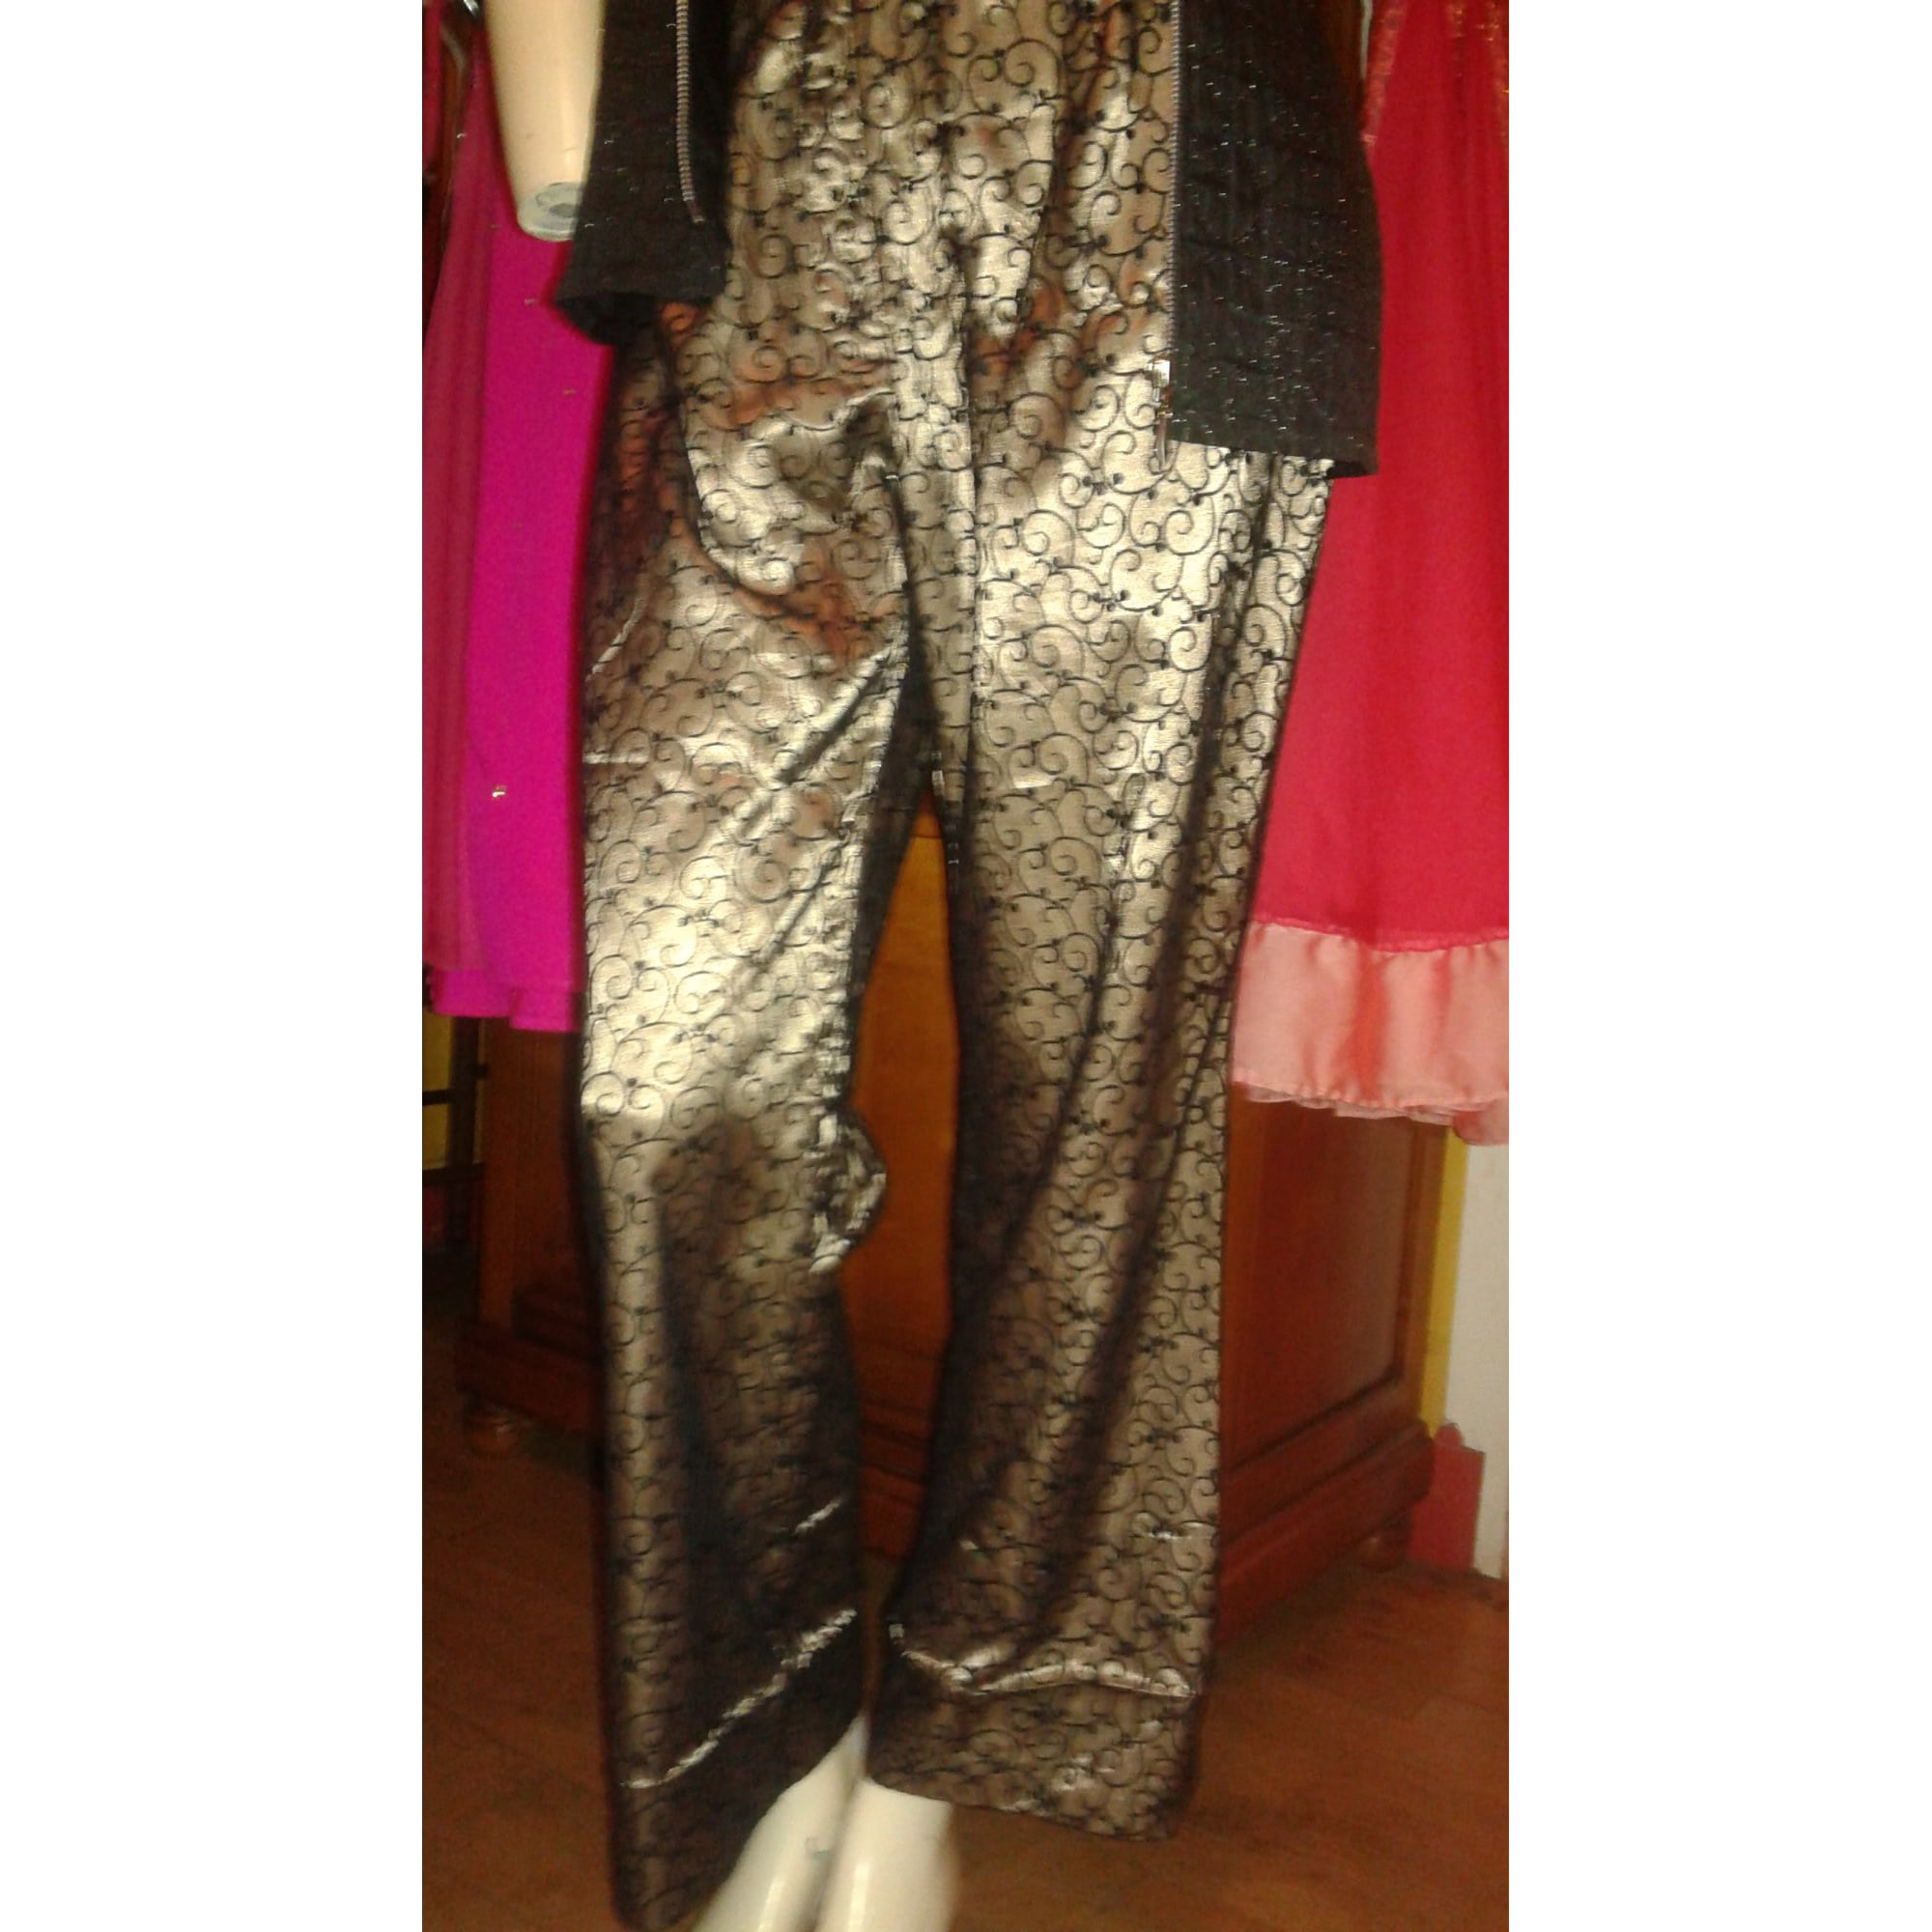 8eba352128d2 Pantalon large ANNE WEYBURN 42 (L XL, T4) noir - 7050388